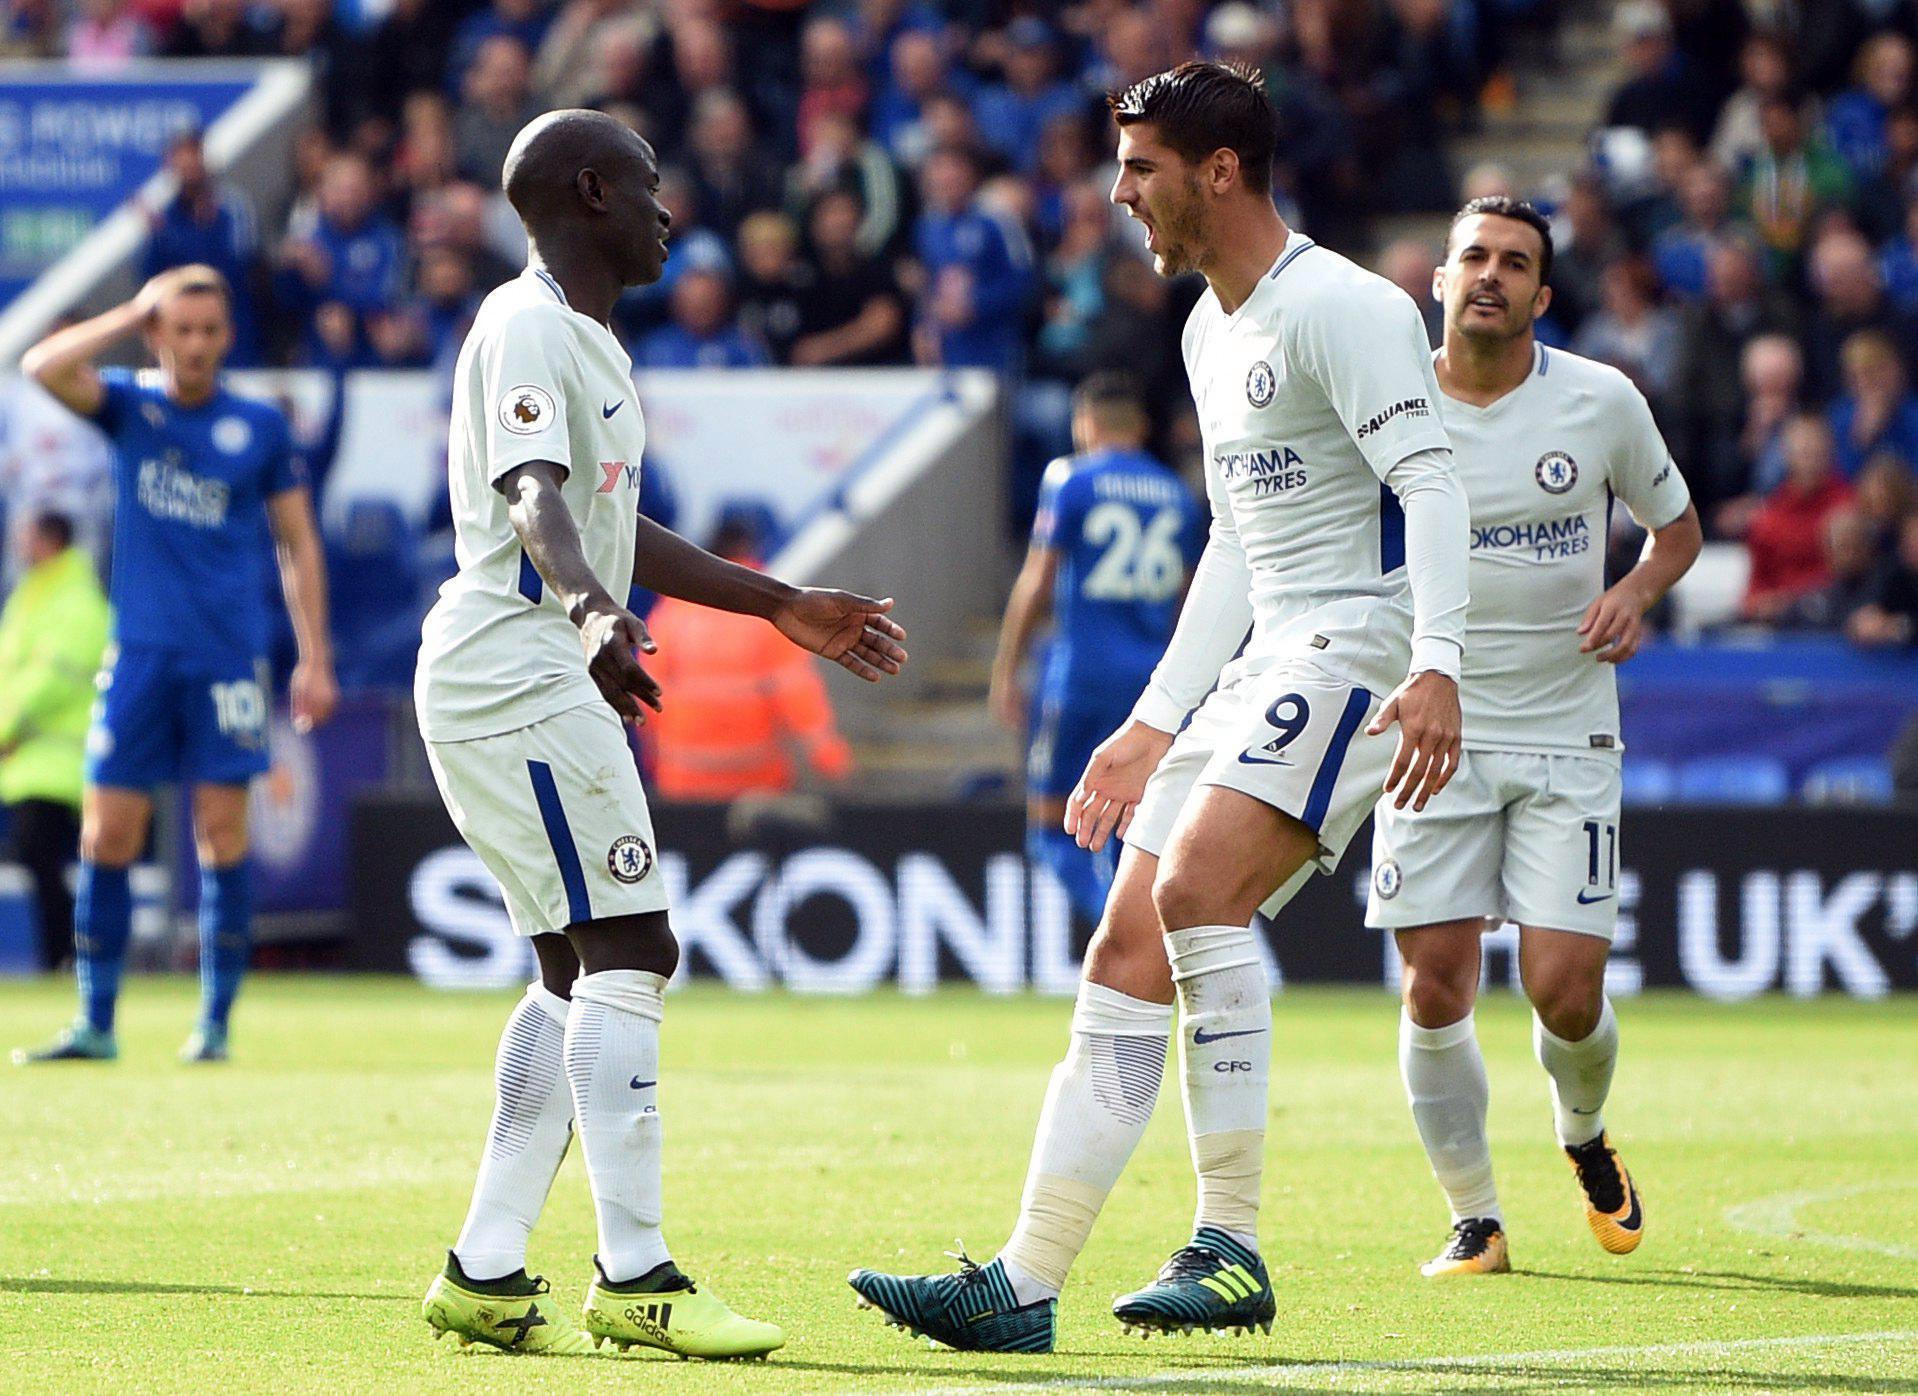 The modest midfielder celebrates his goal with Morata